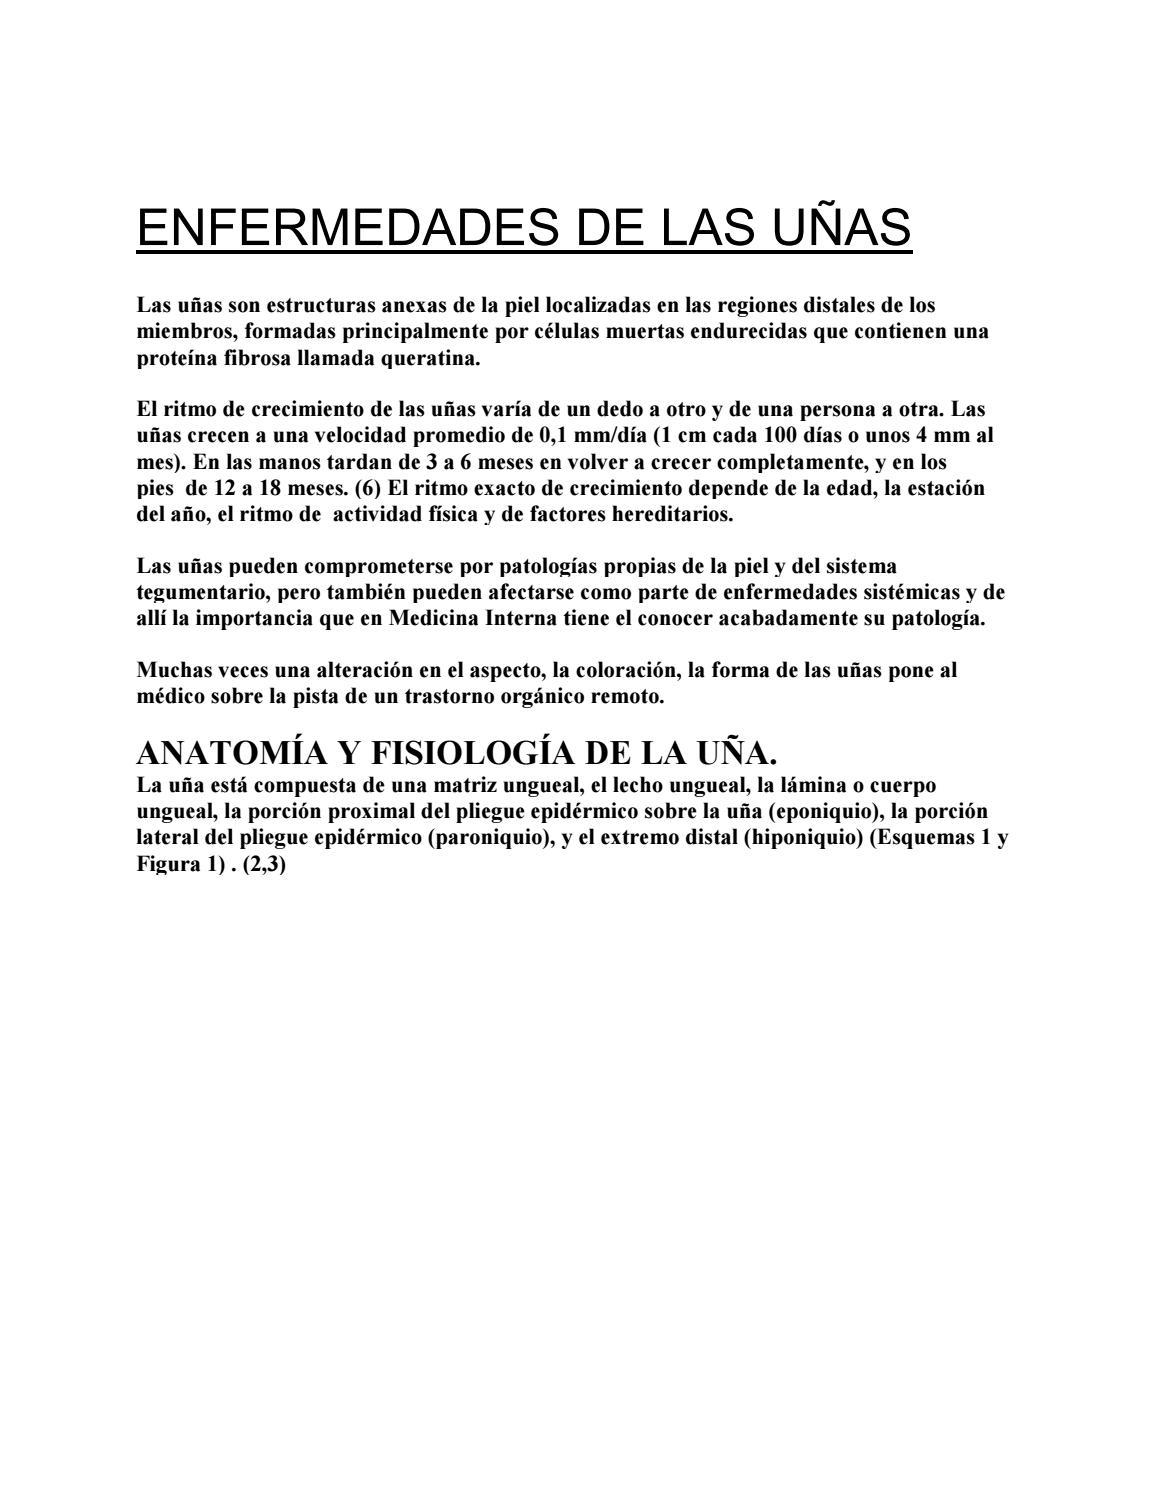 Enfermedades de las Uñas by Podoline - issuu